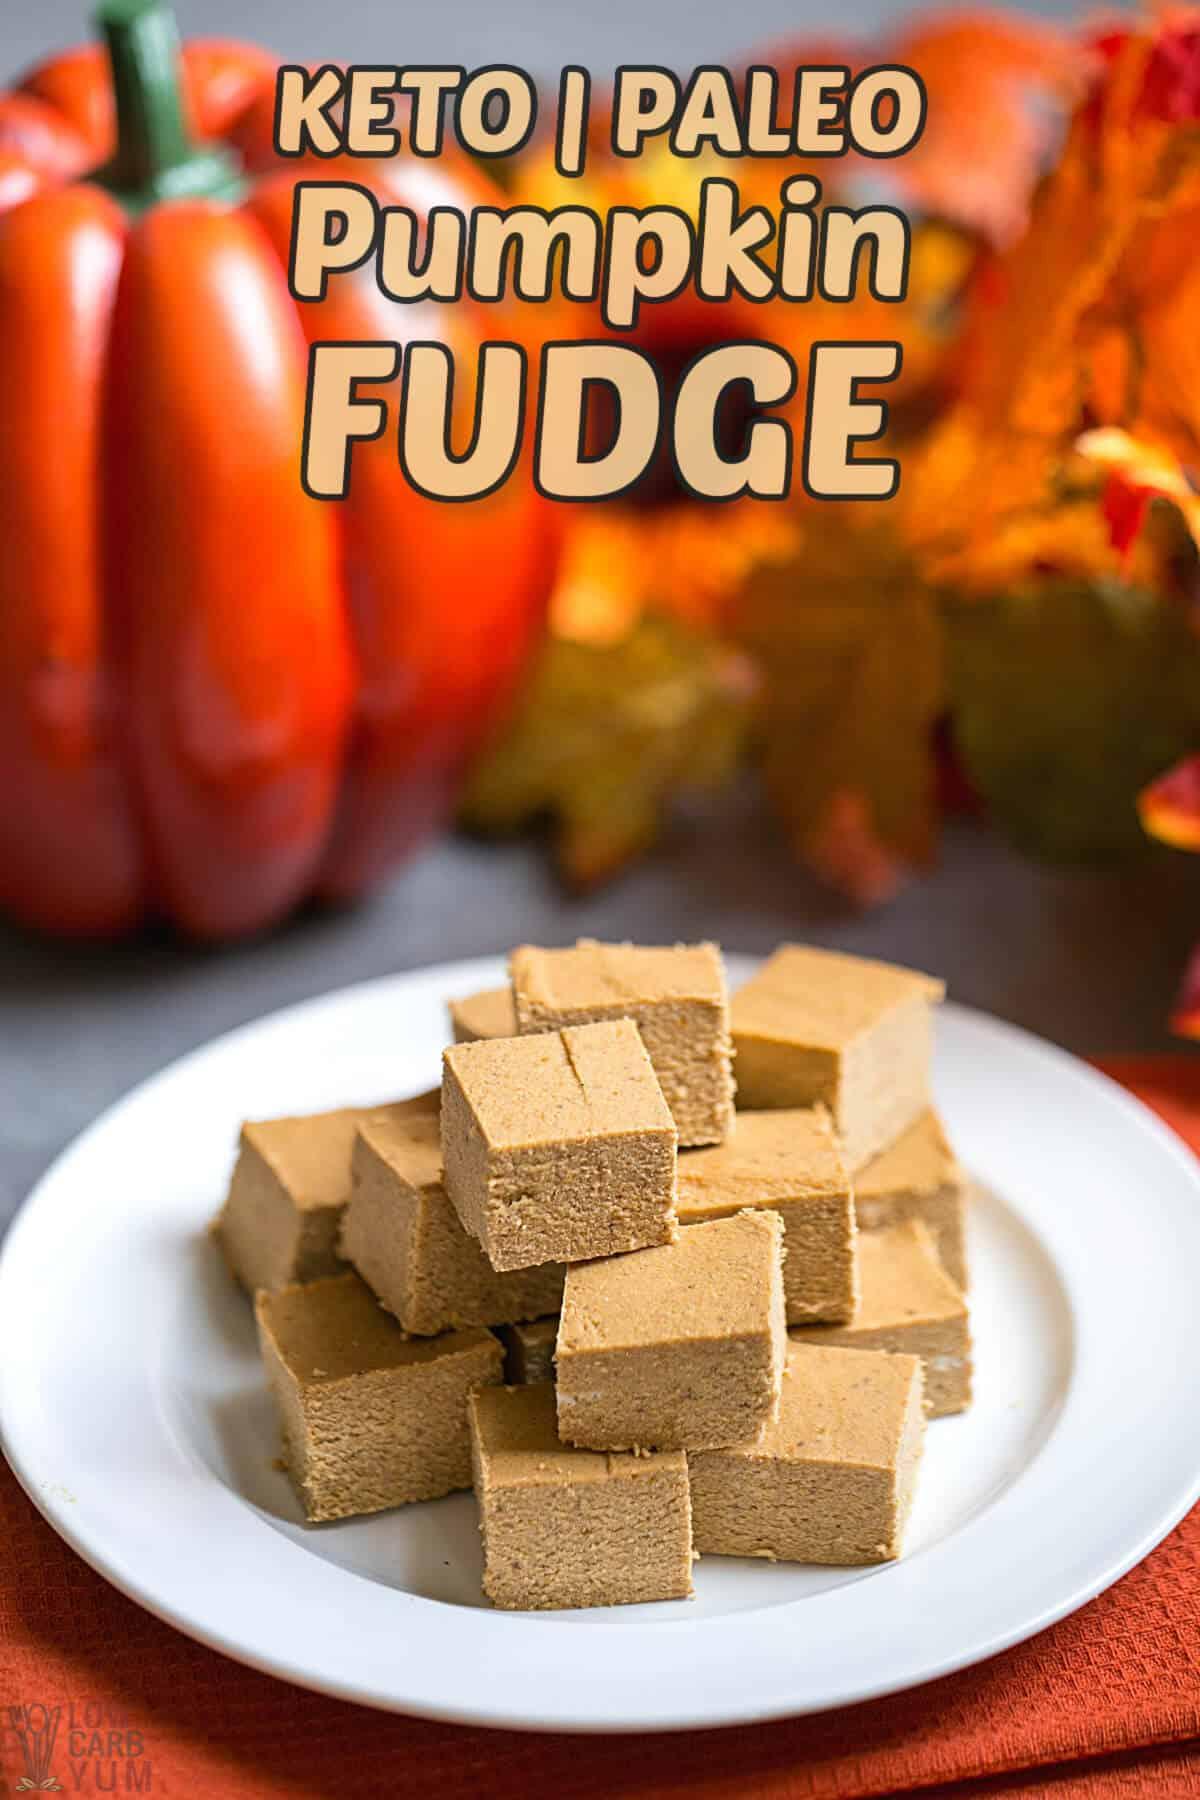 keto paleo pumpkin fudge recipe cover image